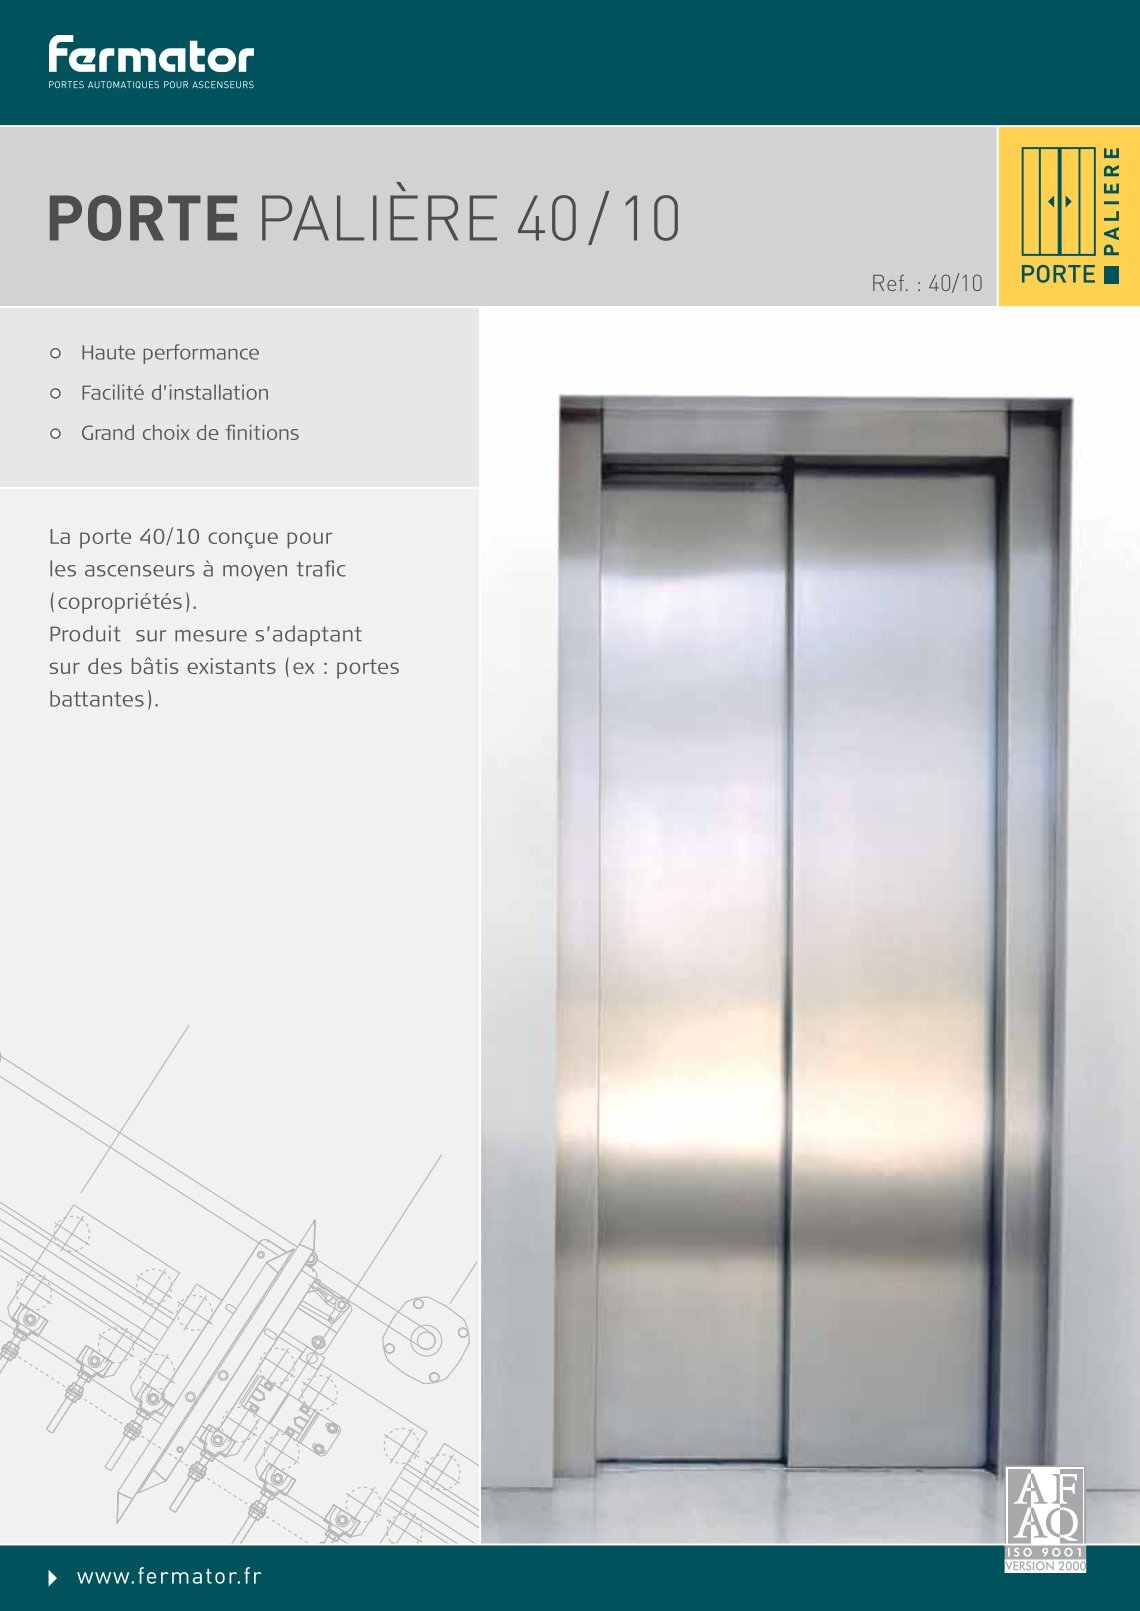 Free Magazines From FERMATORFR - Porte paliere